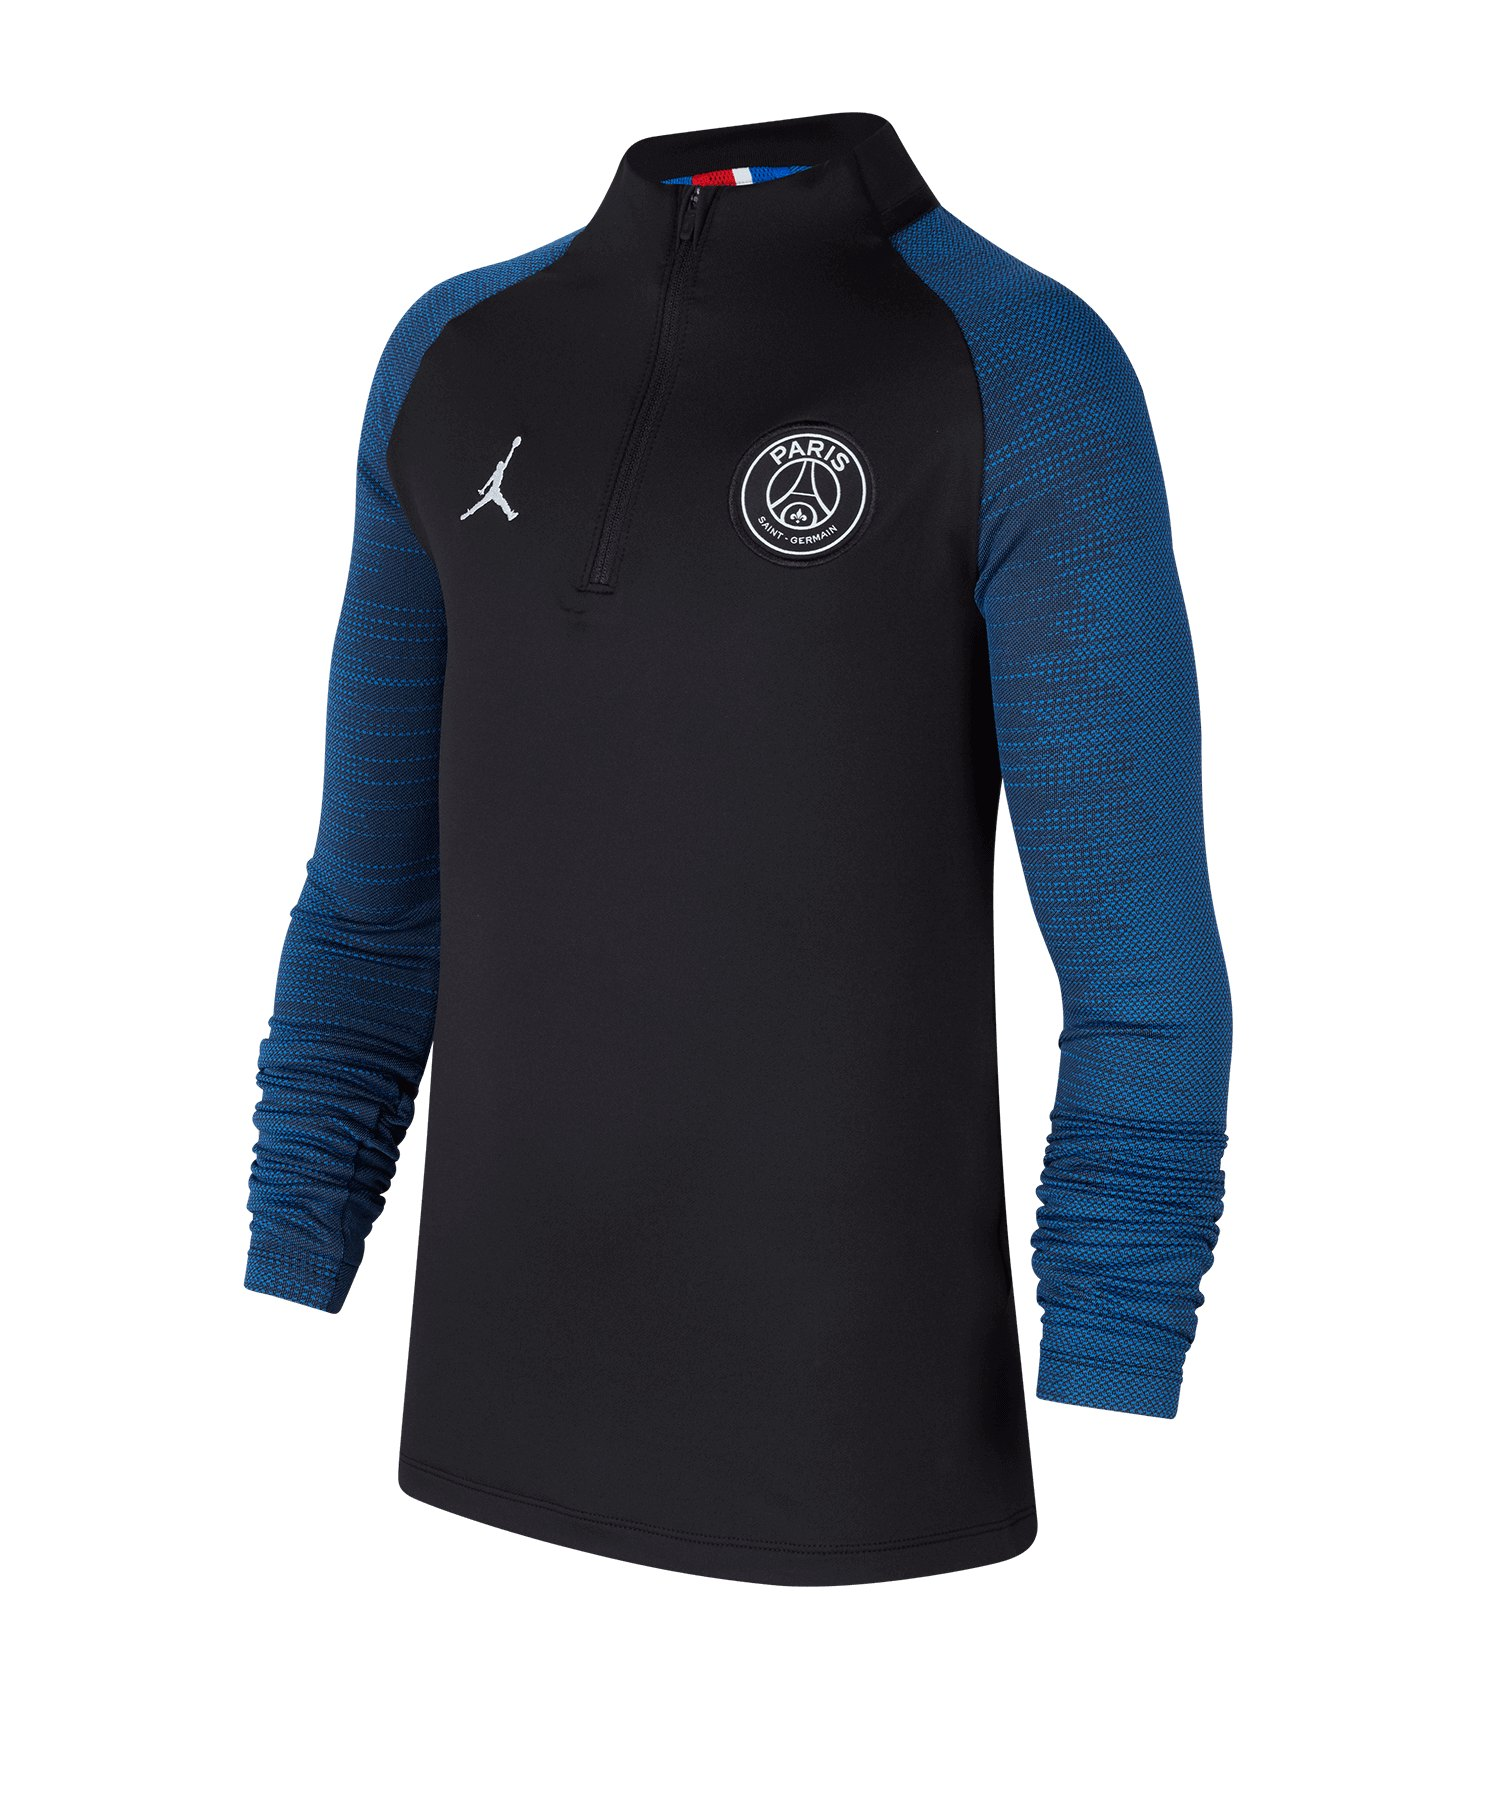 Jordan Paris St. Germain 1/4 Zip Shirt Kids F010 - schwarz